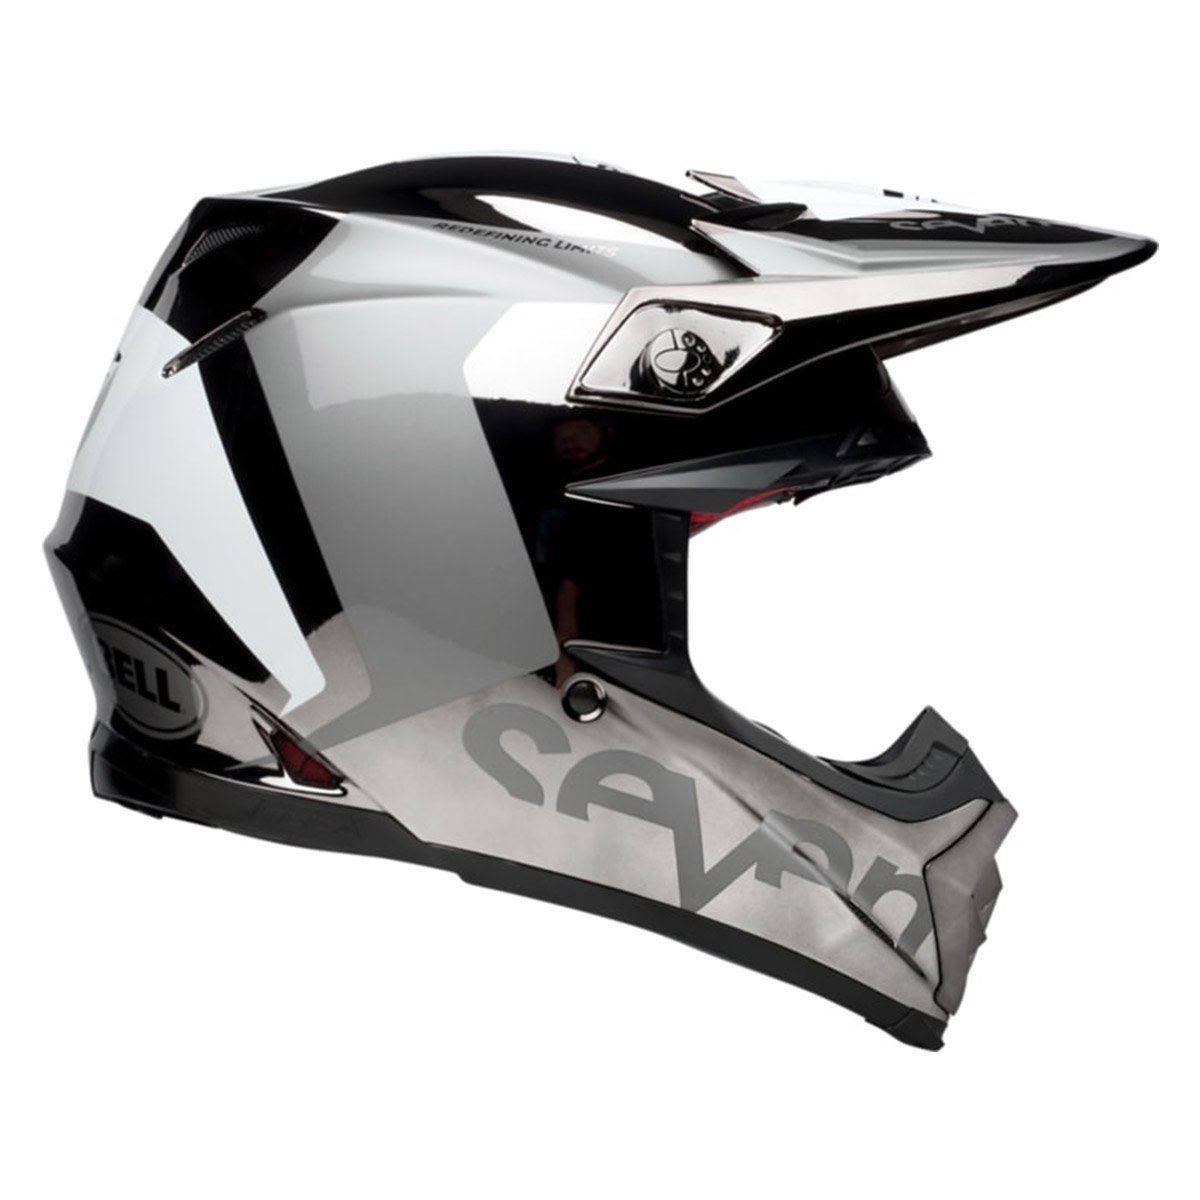 Shop Bell Moto 9 Carbon Flex Seven Rogue Motocross Helmet By Size Color More From Motorcycler Com Free Shipping On Order Motocross Helmets Bell Moto Helmet